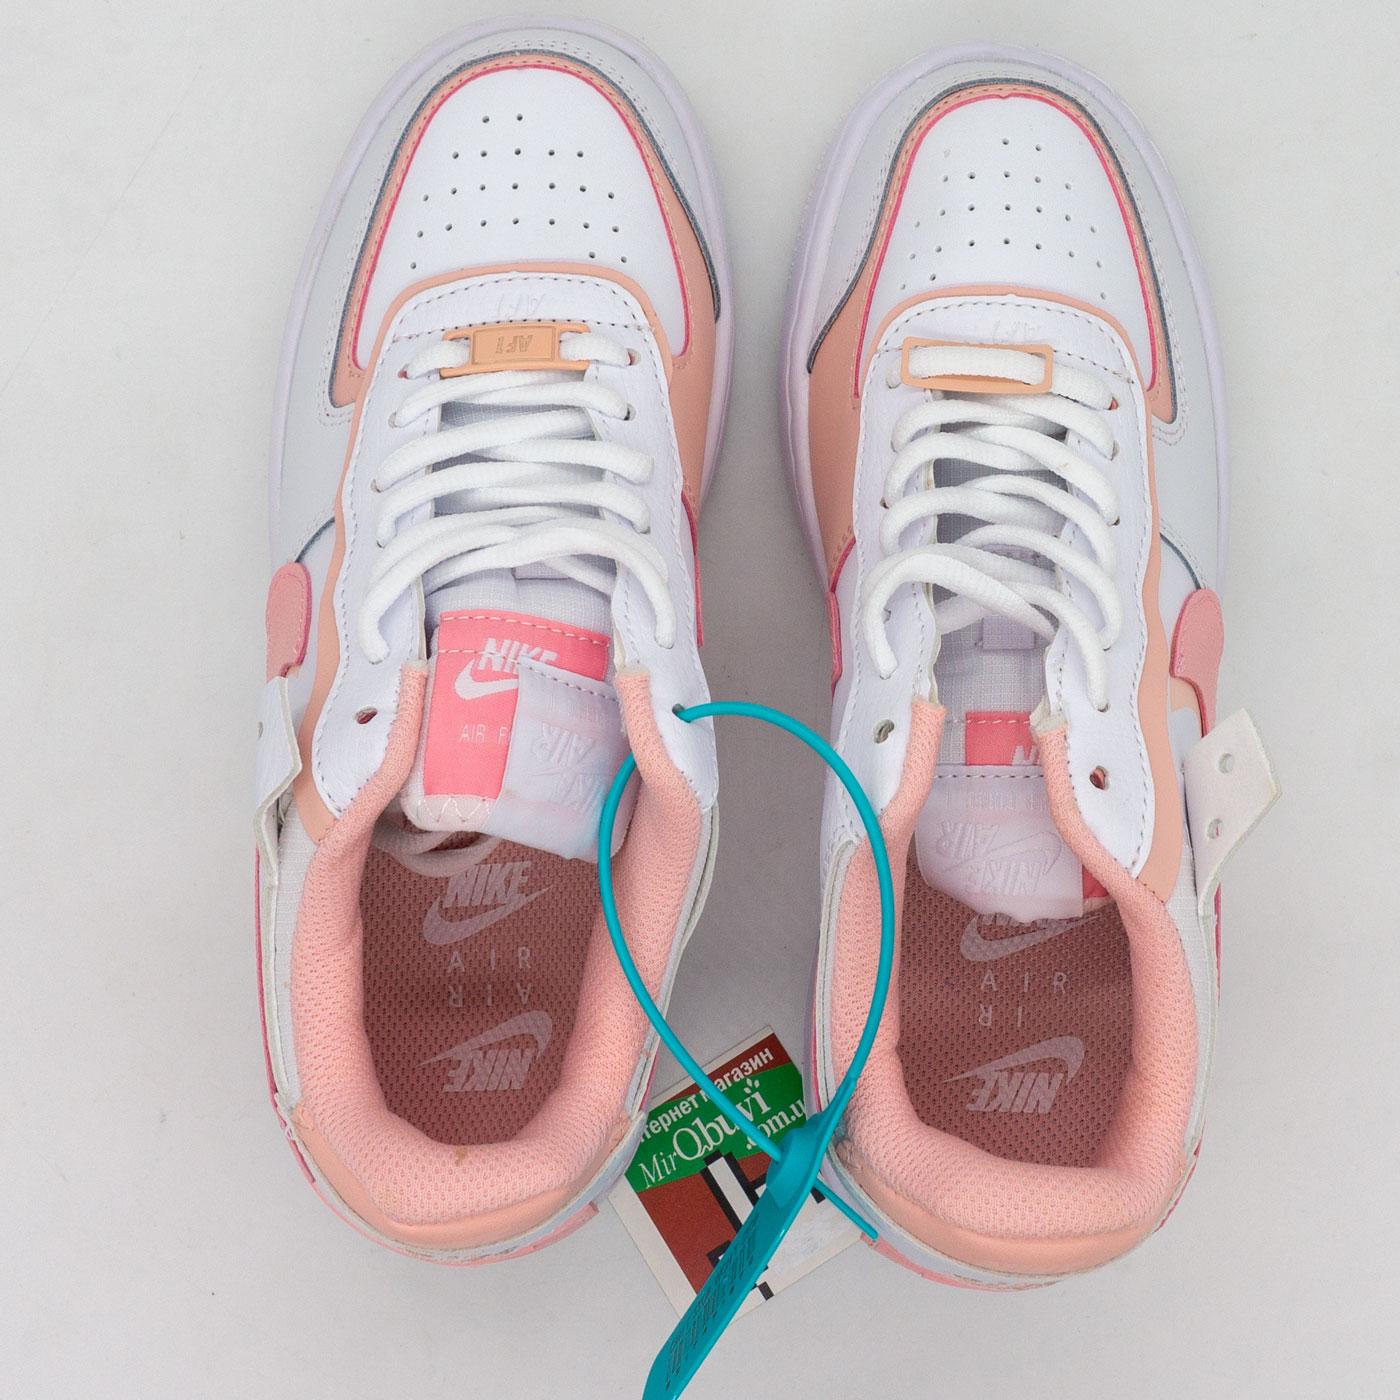 фото bottom Кроссовки Nike Air Force 1 Shadow бело-розовые - Топ качество bottom